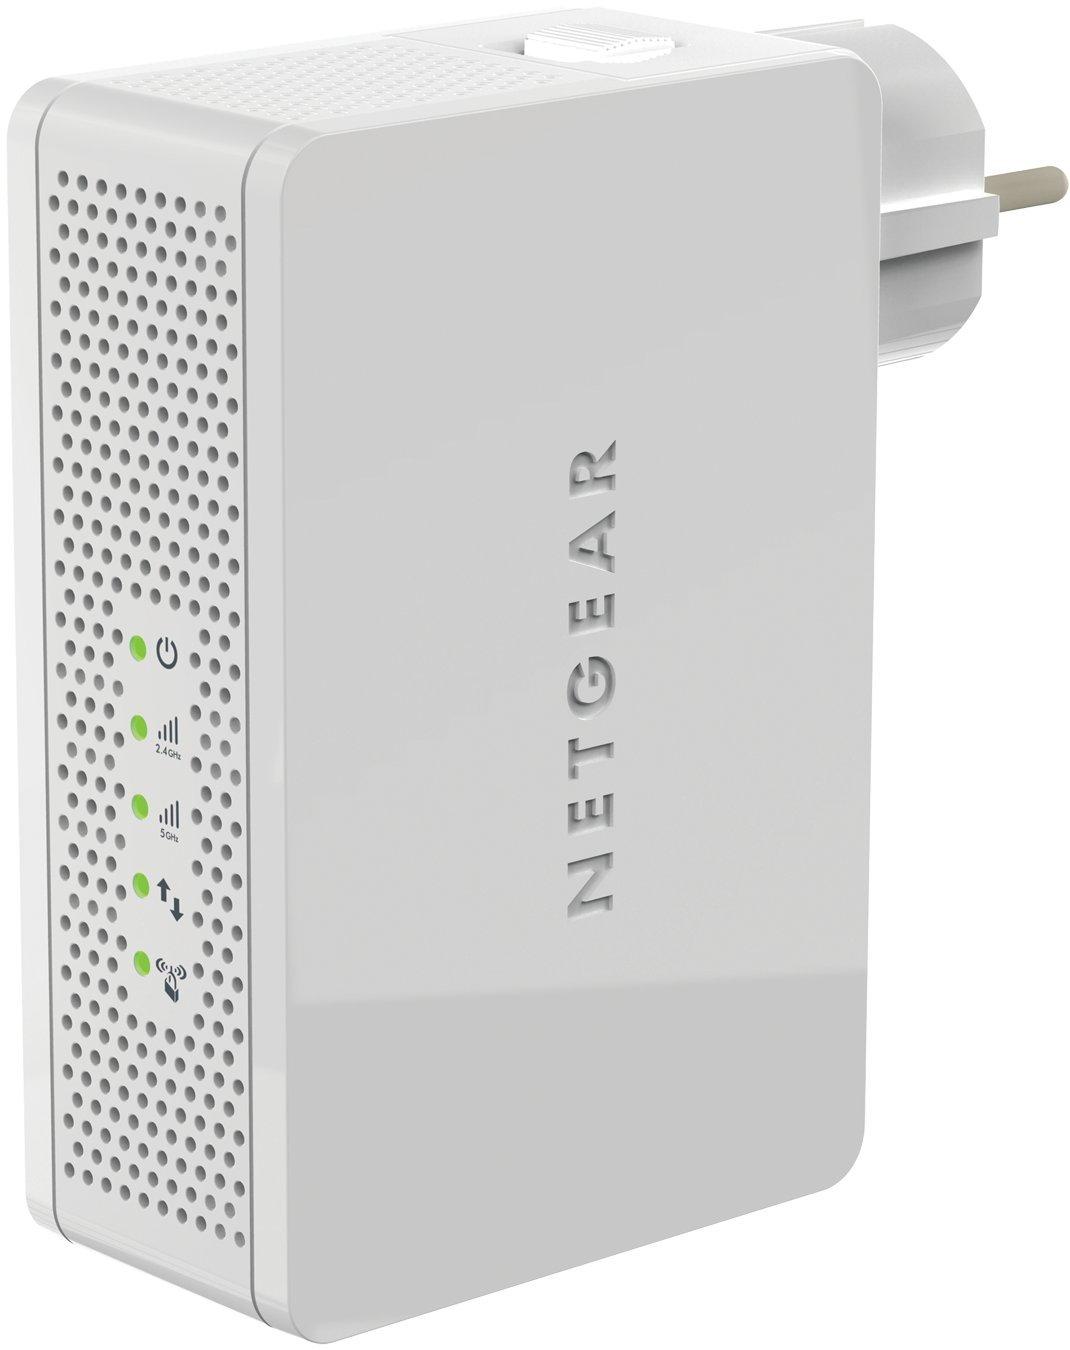 NETGEAR WN3500RP-100PES Wall-Plug Edition Universal: Amazon.de ...